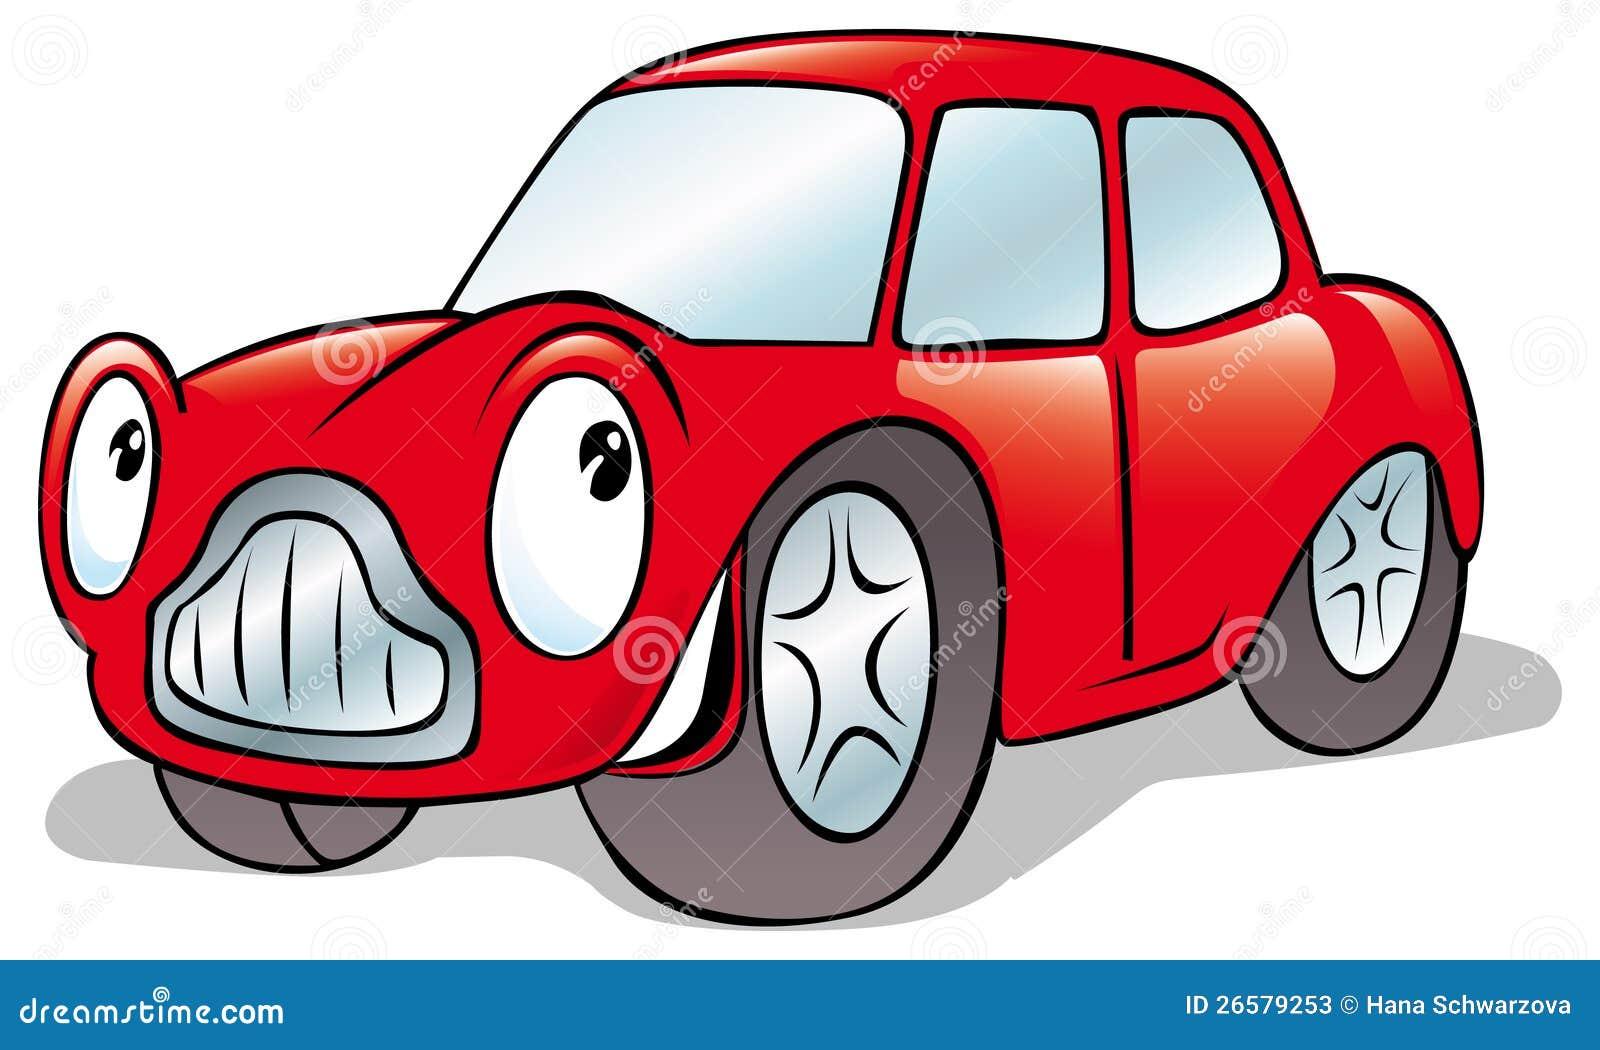 funny car cartoon stock vector illustration of line 22819673